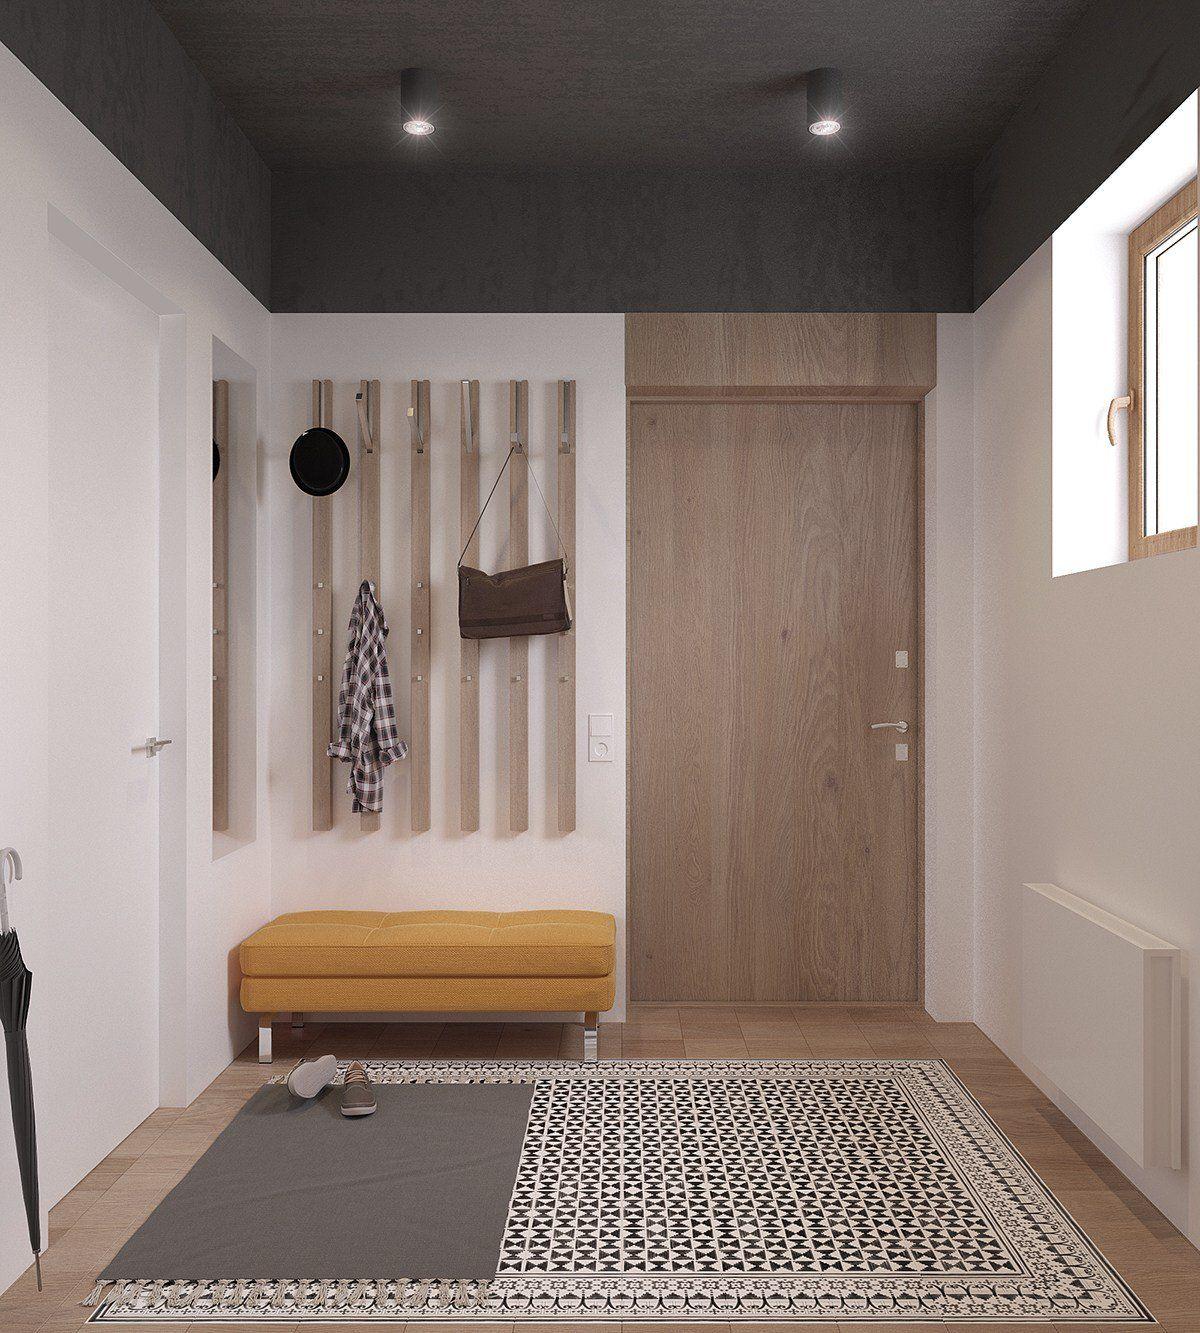 Originale appartamento stile scandinavo moderno design for Arredamento originale casa